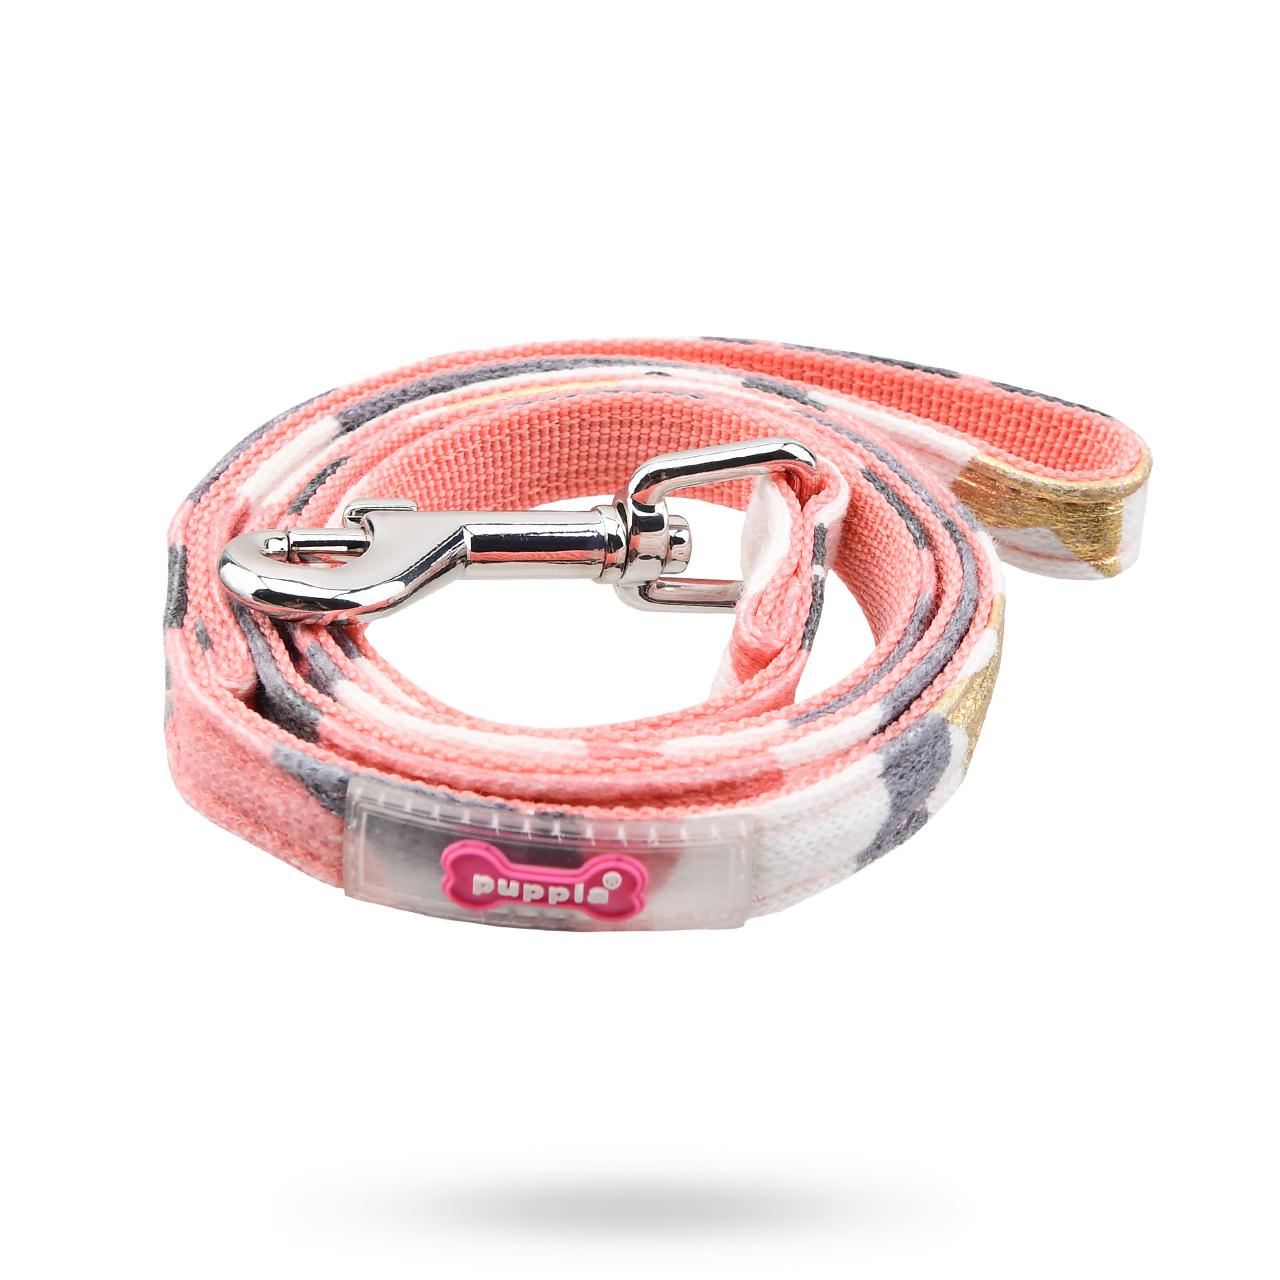 Ensign Pink Camo - Hundkoppel i Tyg